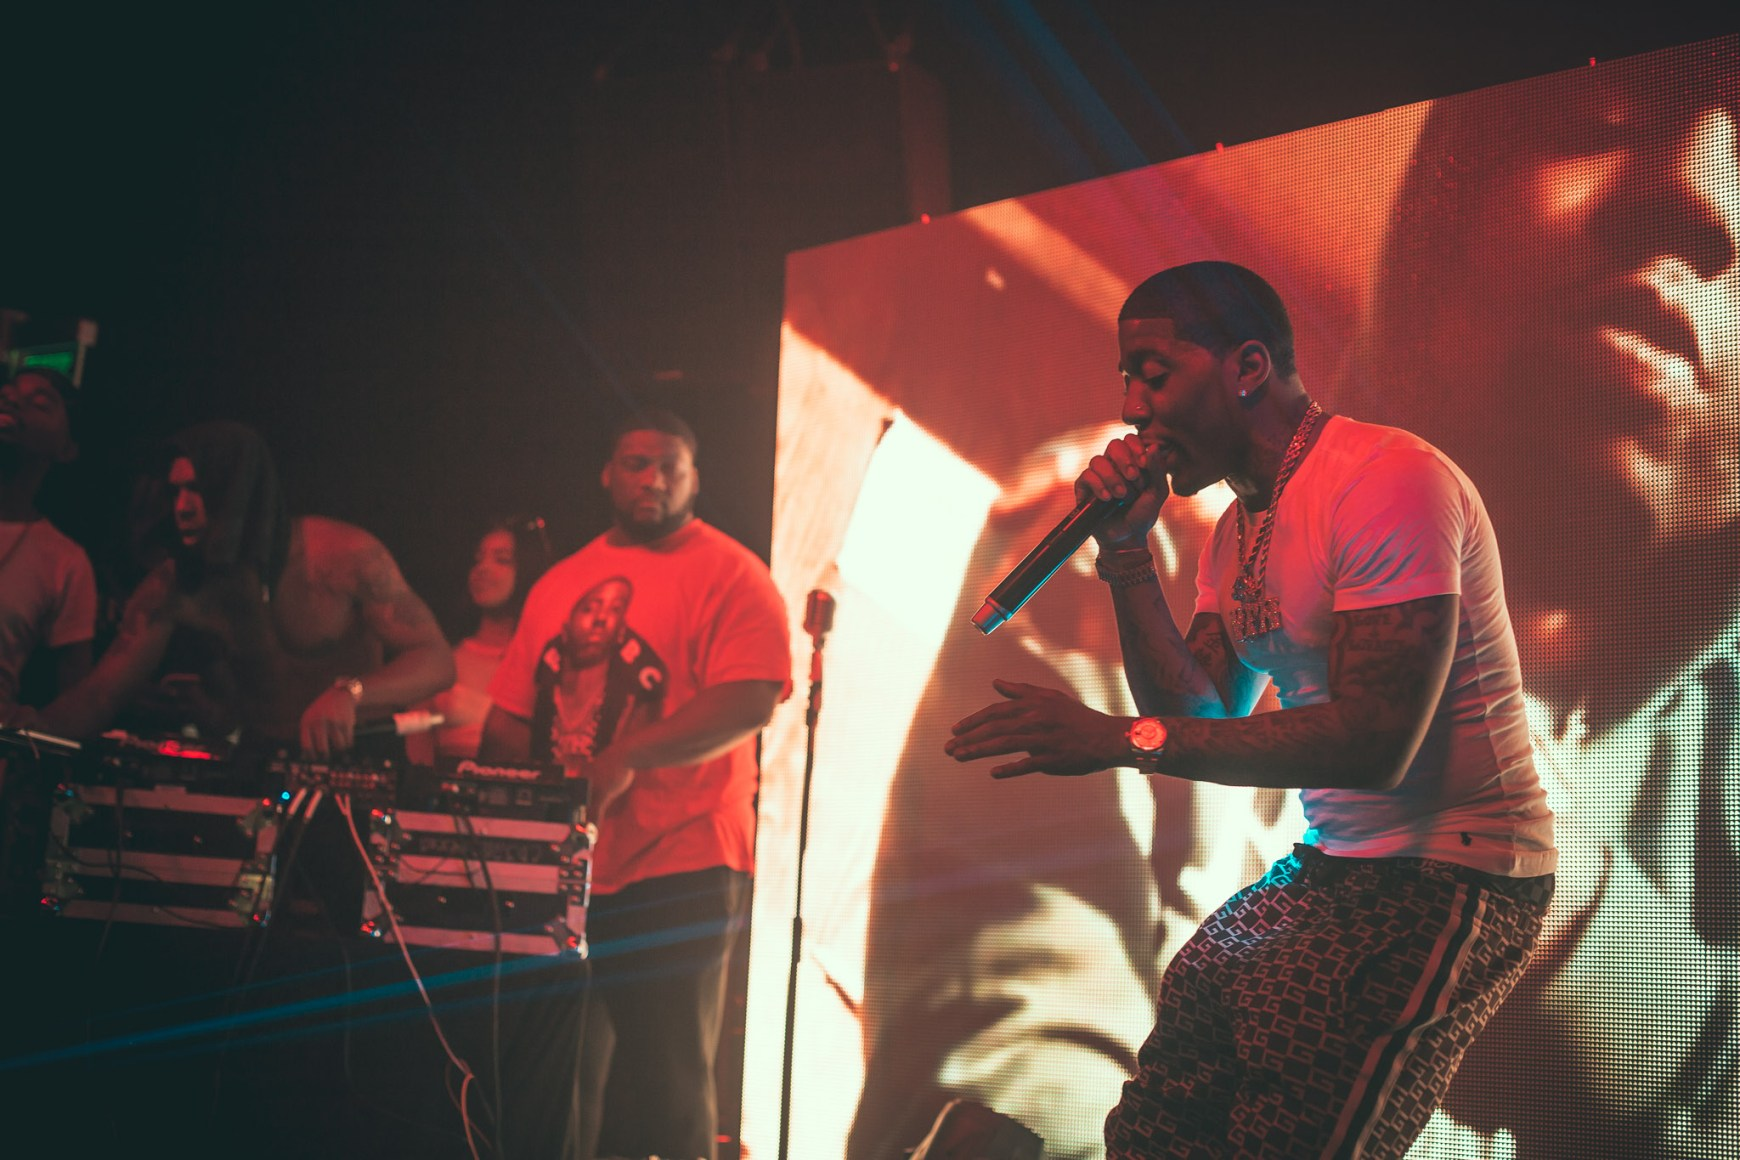 YFN Lucci performing at Coda in Philadelphia, PA.